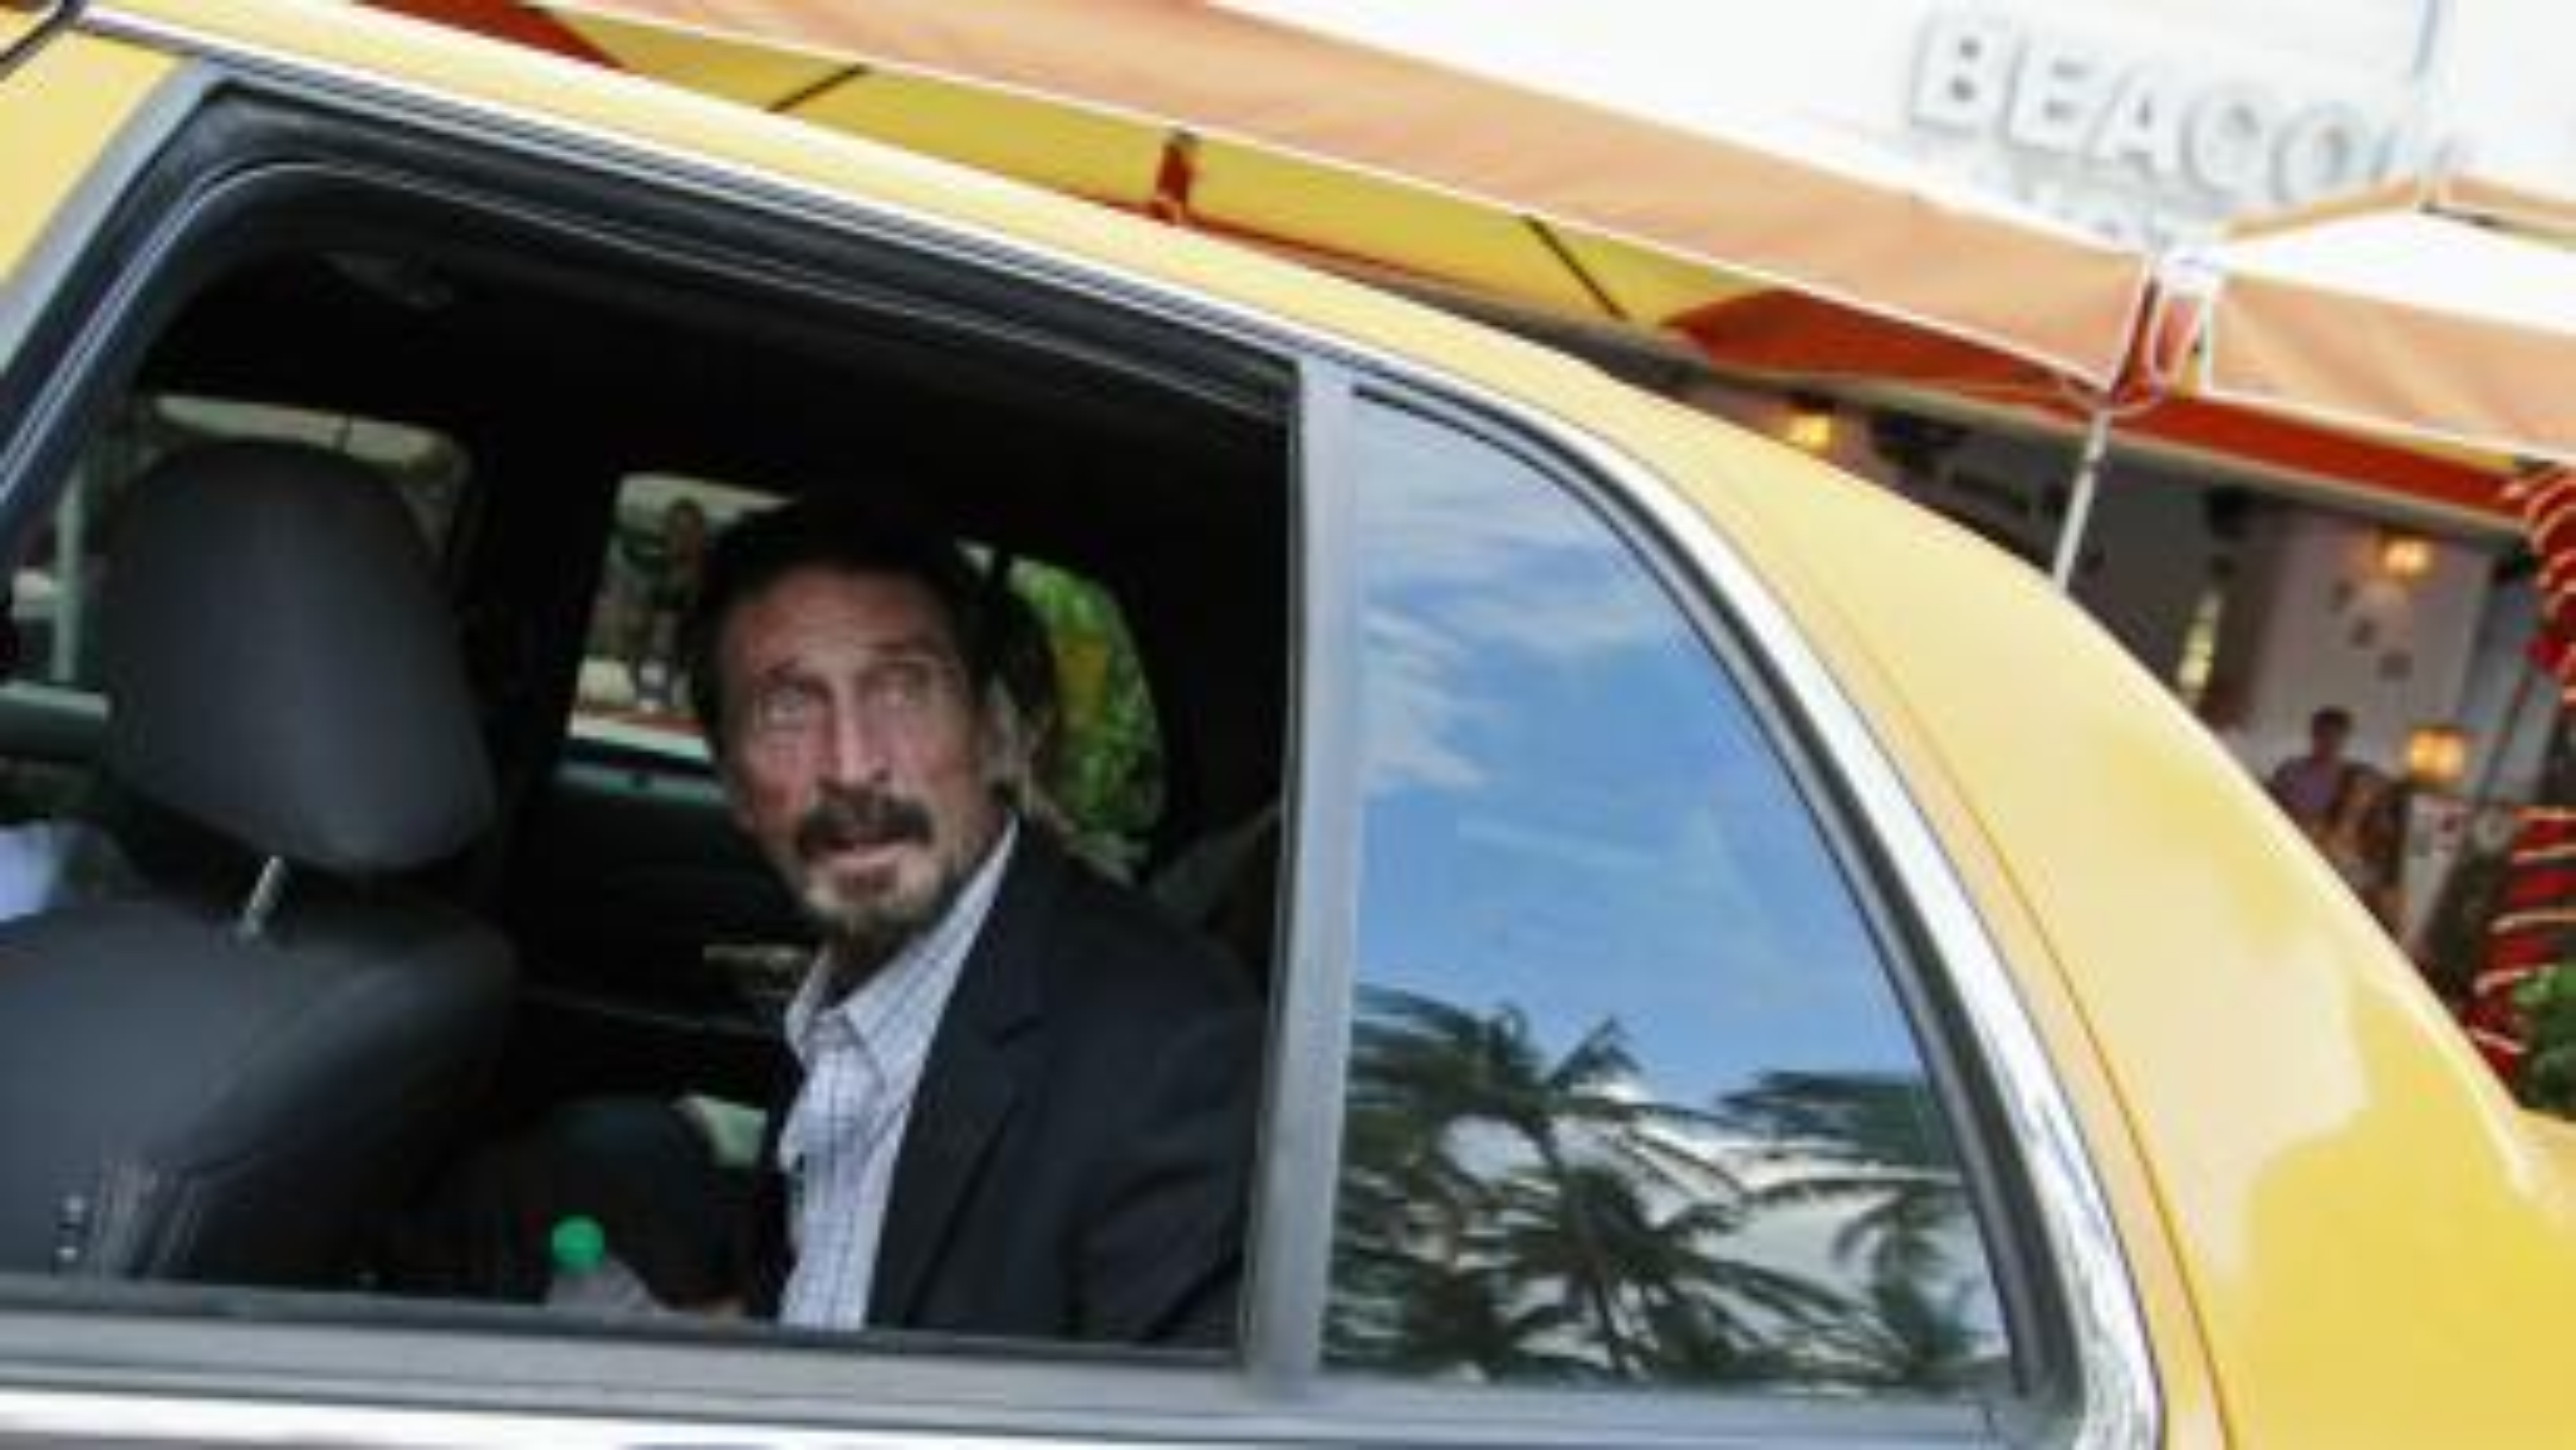 John McAfee in a cab